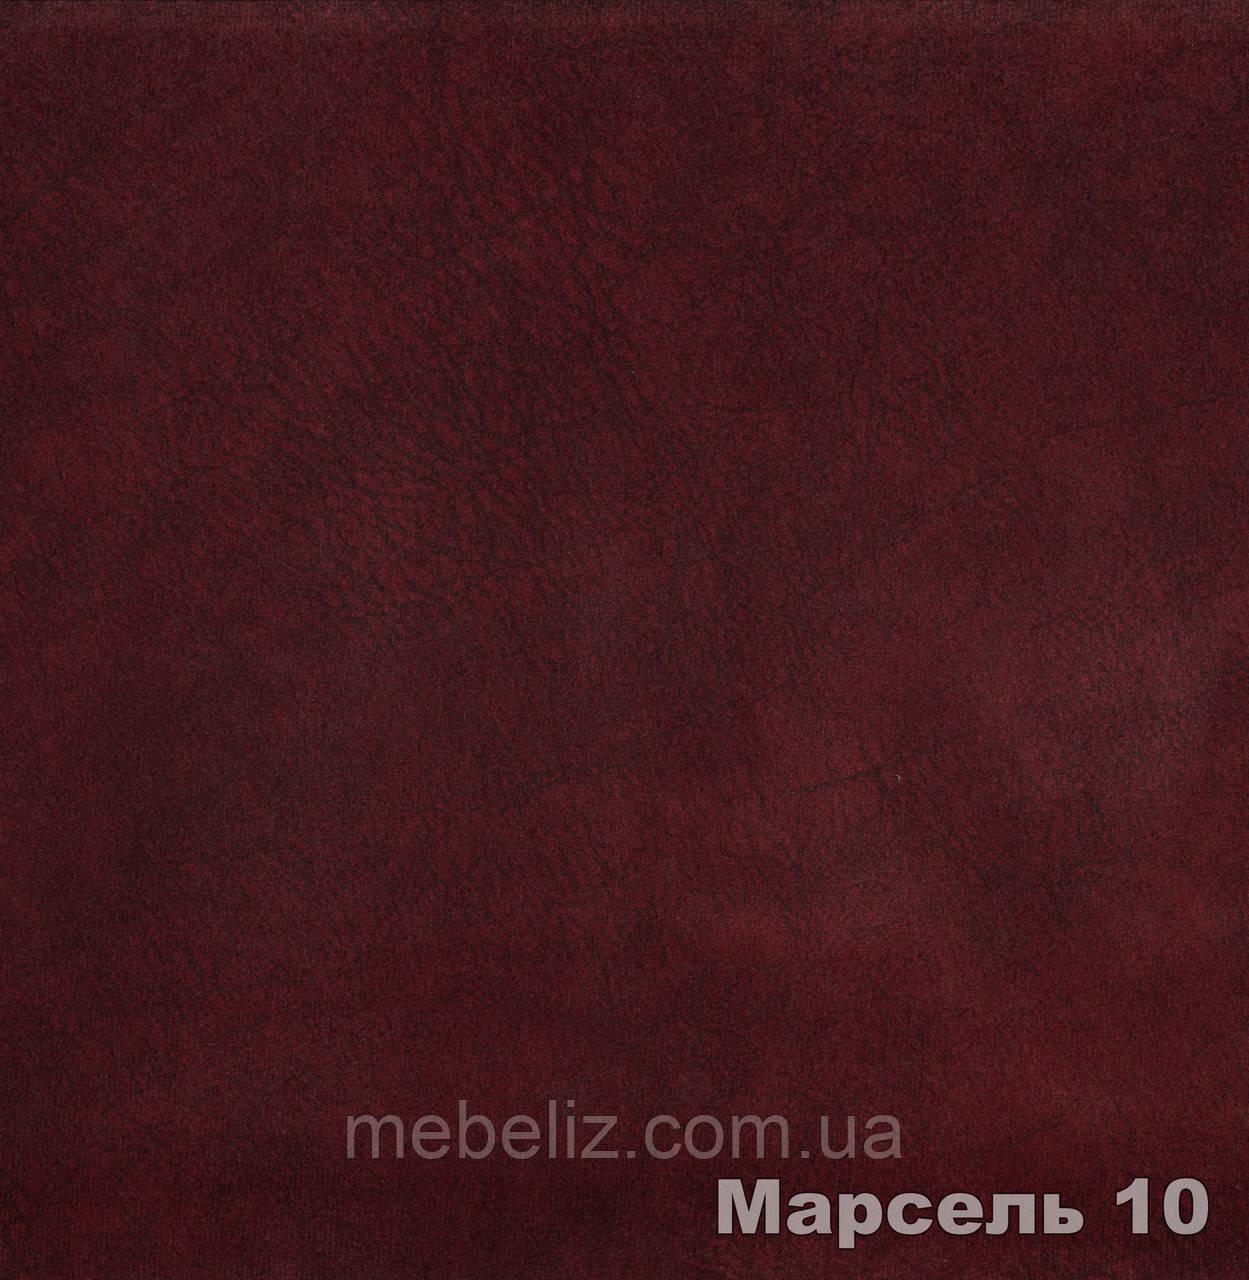 Ткань мебельная обивочная Марсель 10